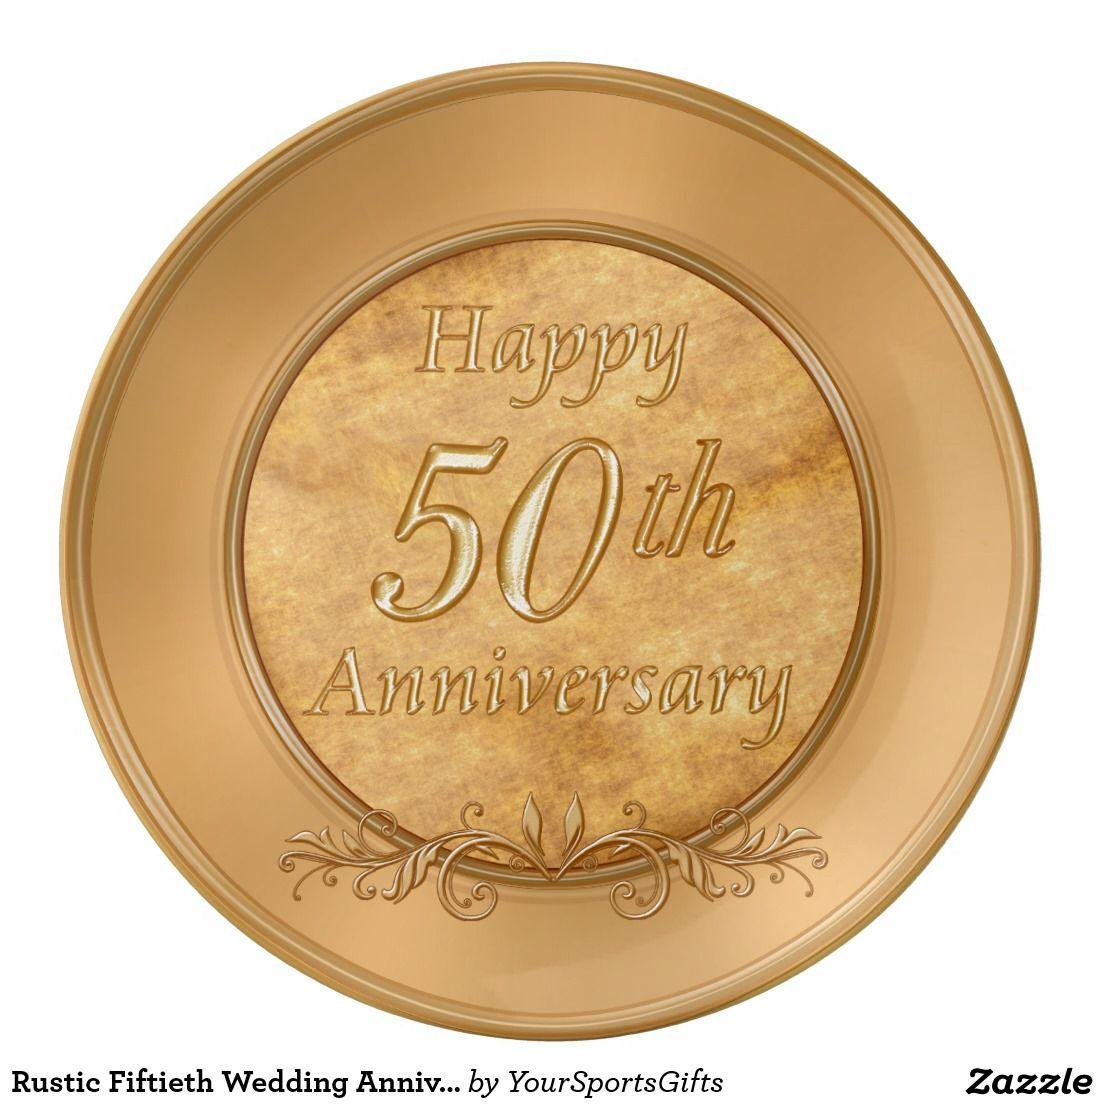 Rustic Fiftieth Wedding Anniversary Gift Ideas Plate